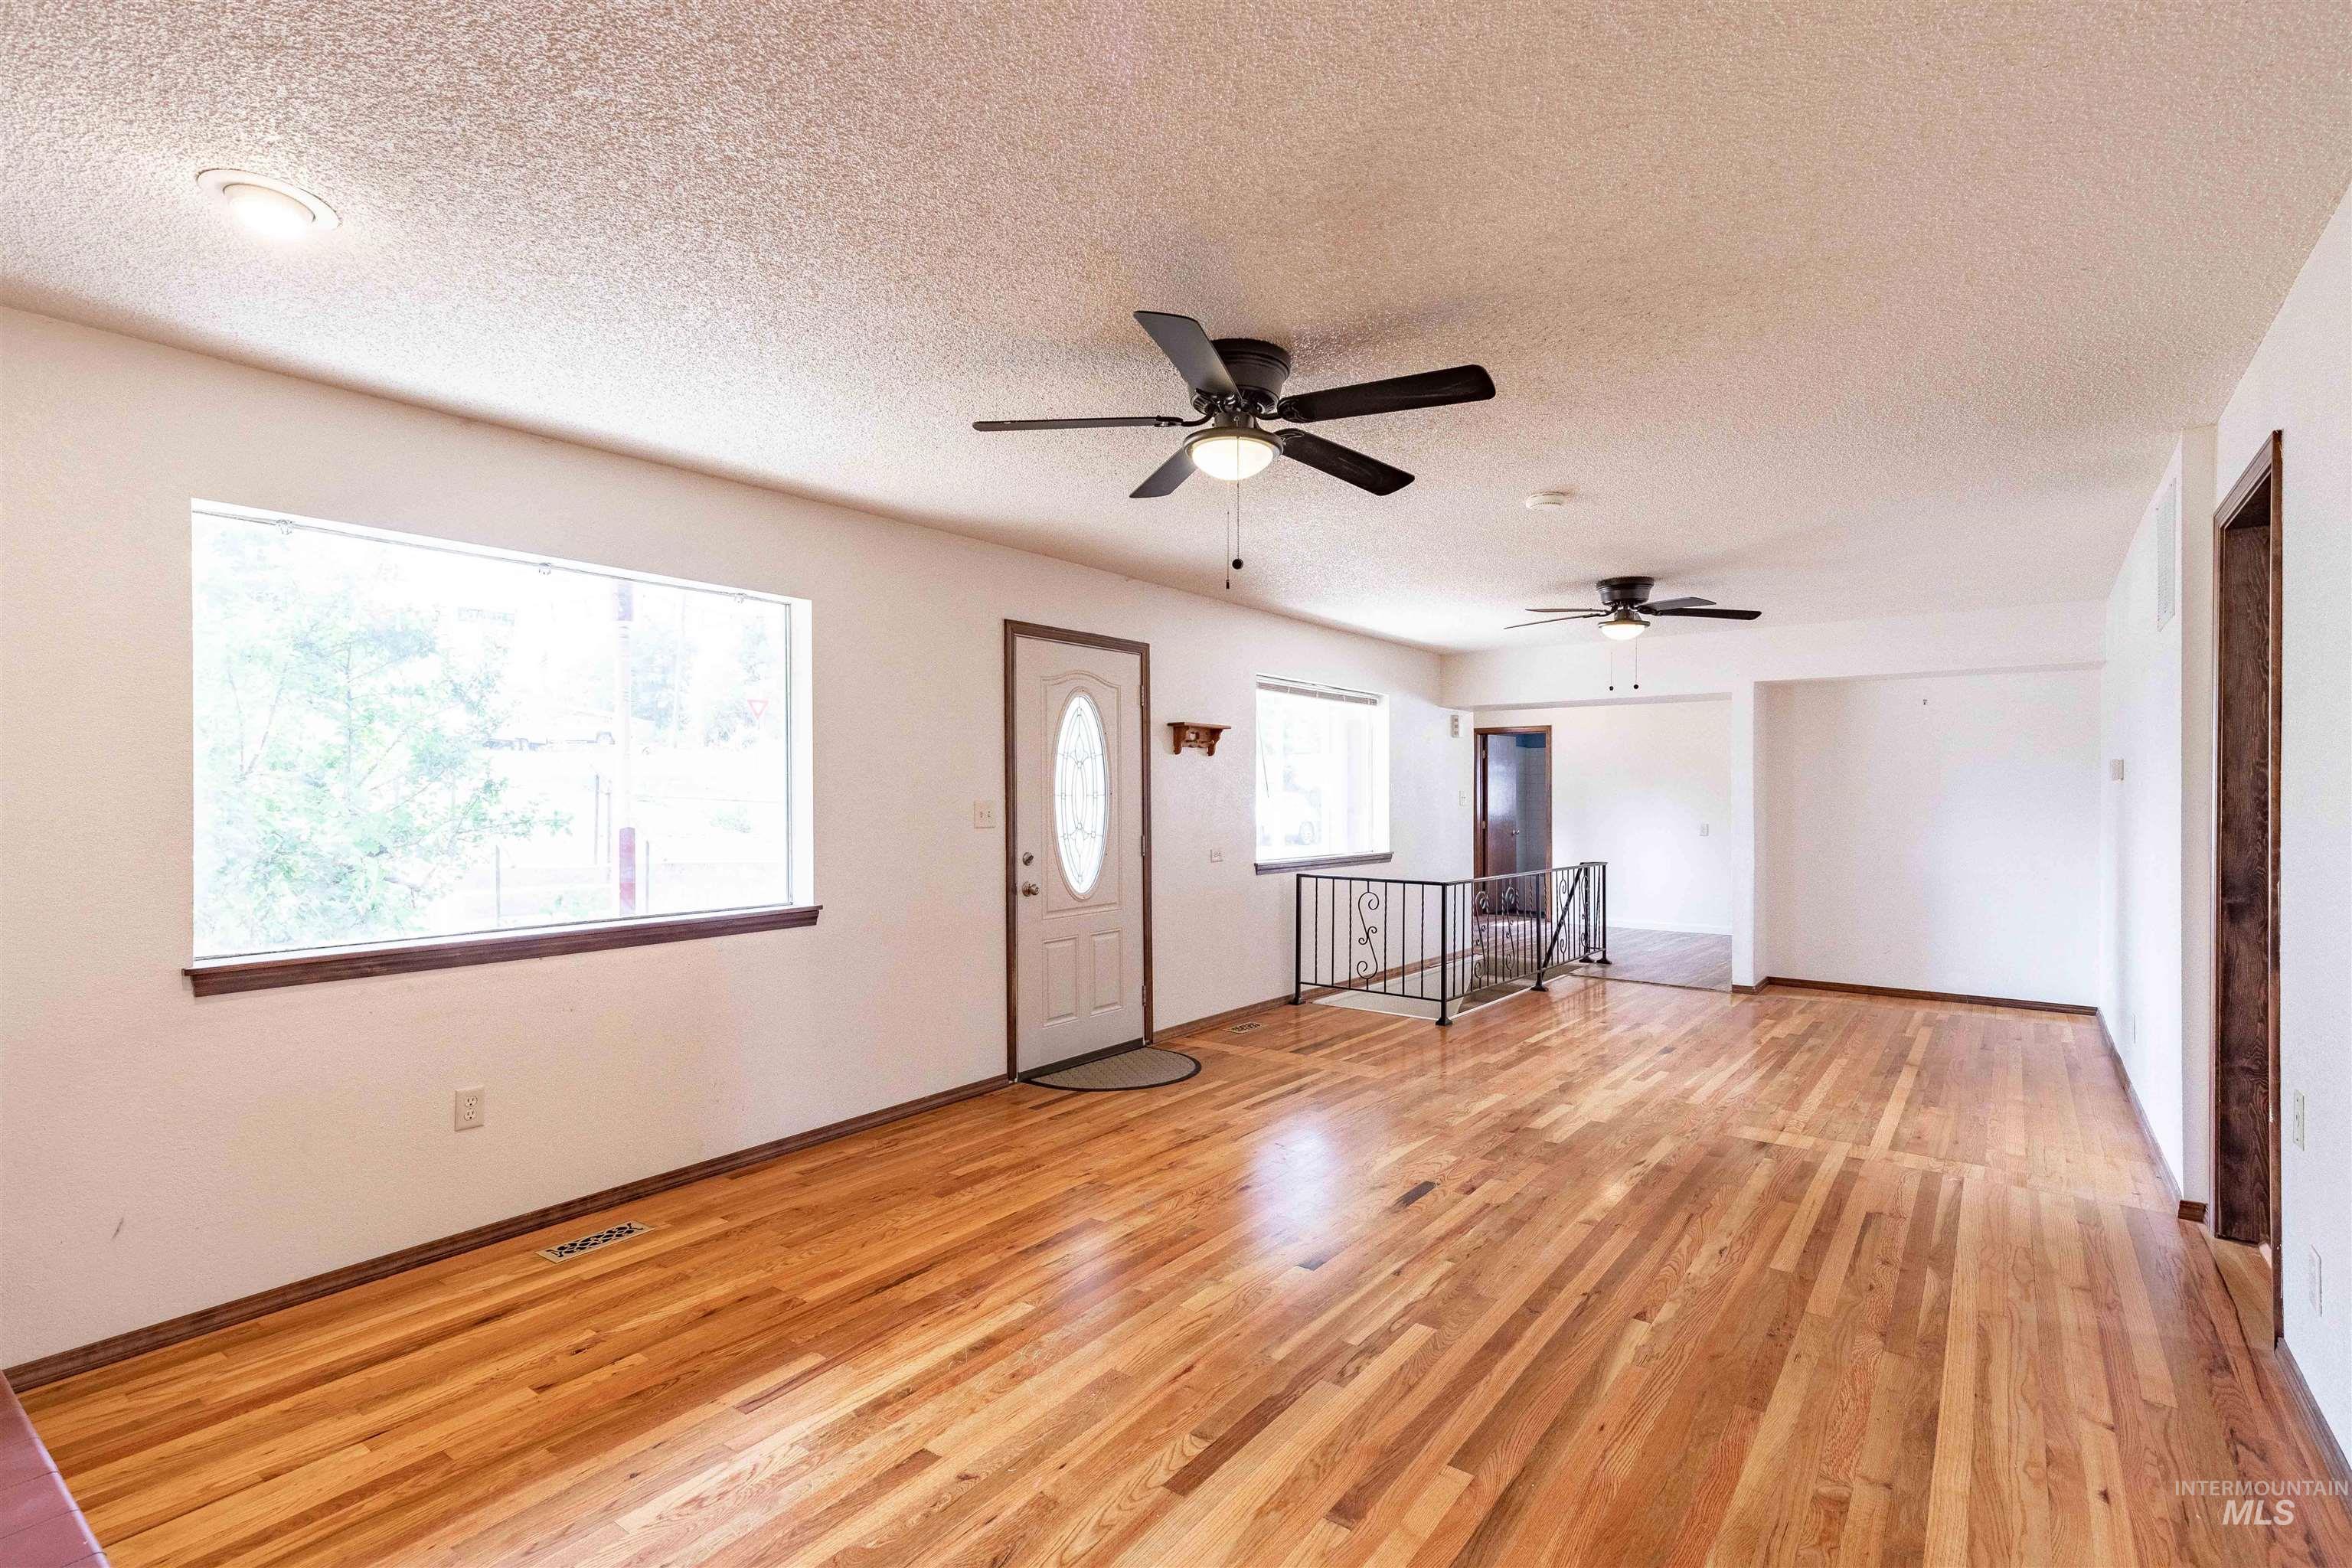 346 N Jackson Property Photo 8